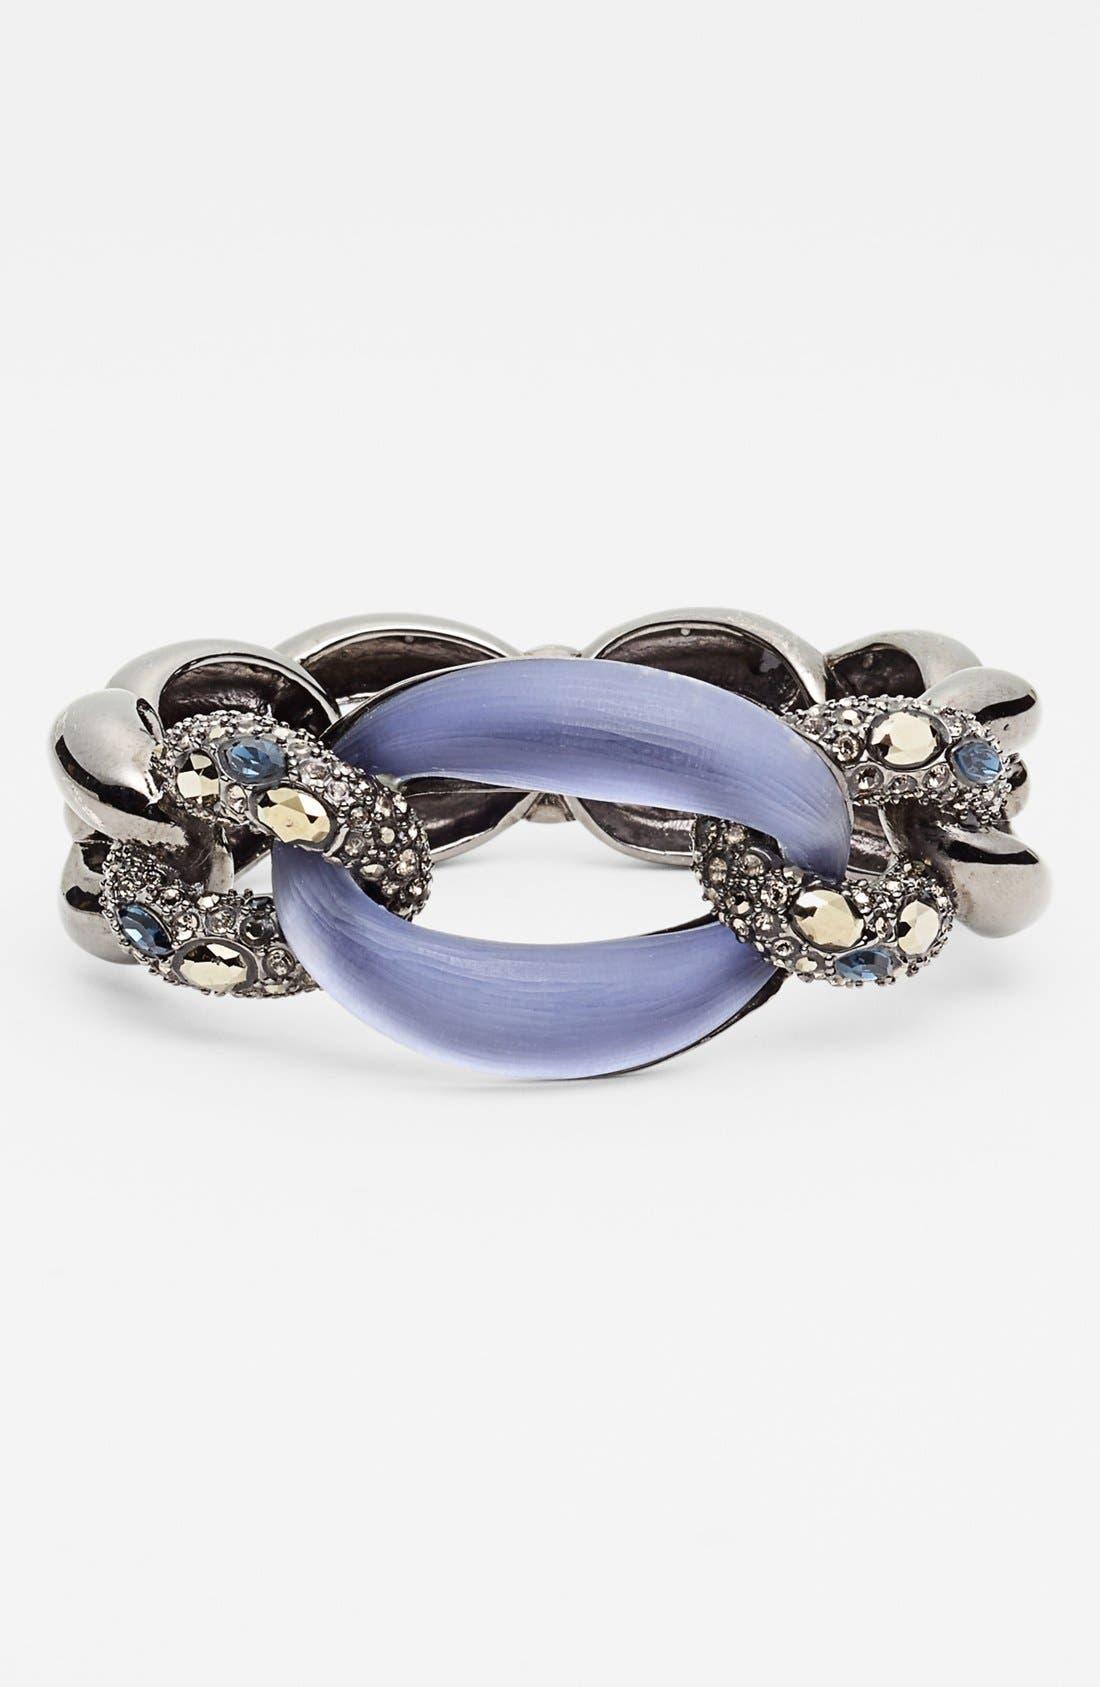 Alternate Image 1 Selected - Alexis Bittar 'Lucite® - Neo Bohemian' Link Hinged Bracelet